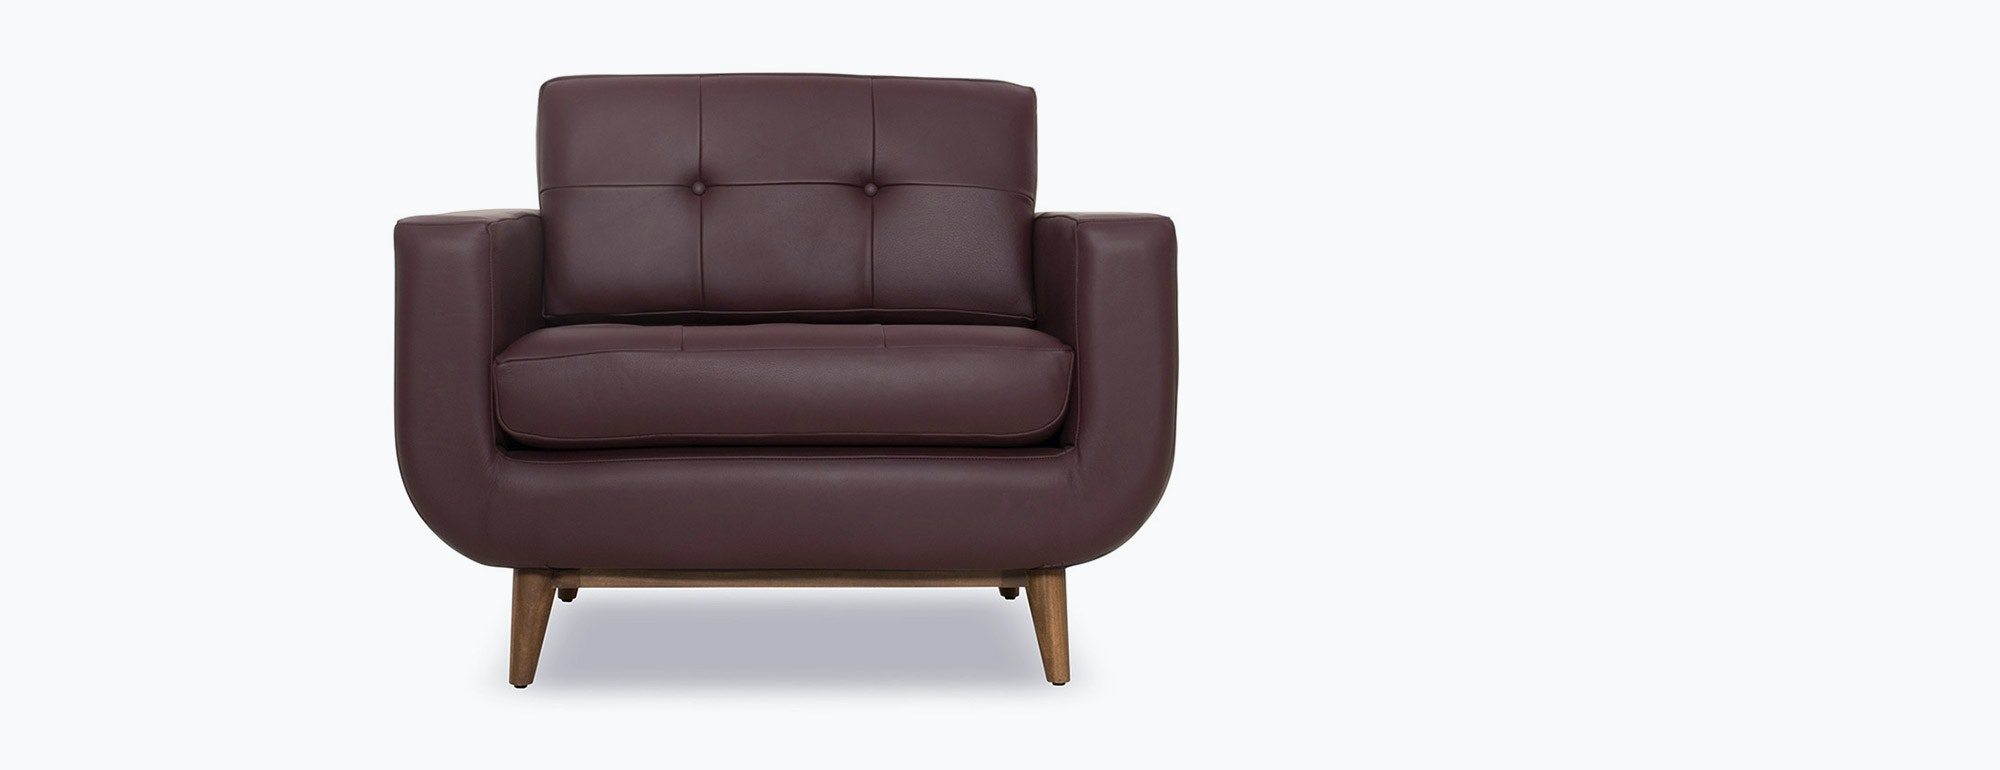 shown in Brighton Aubergine Leather